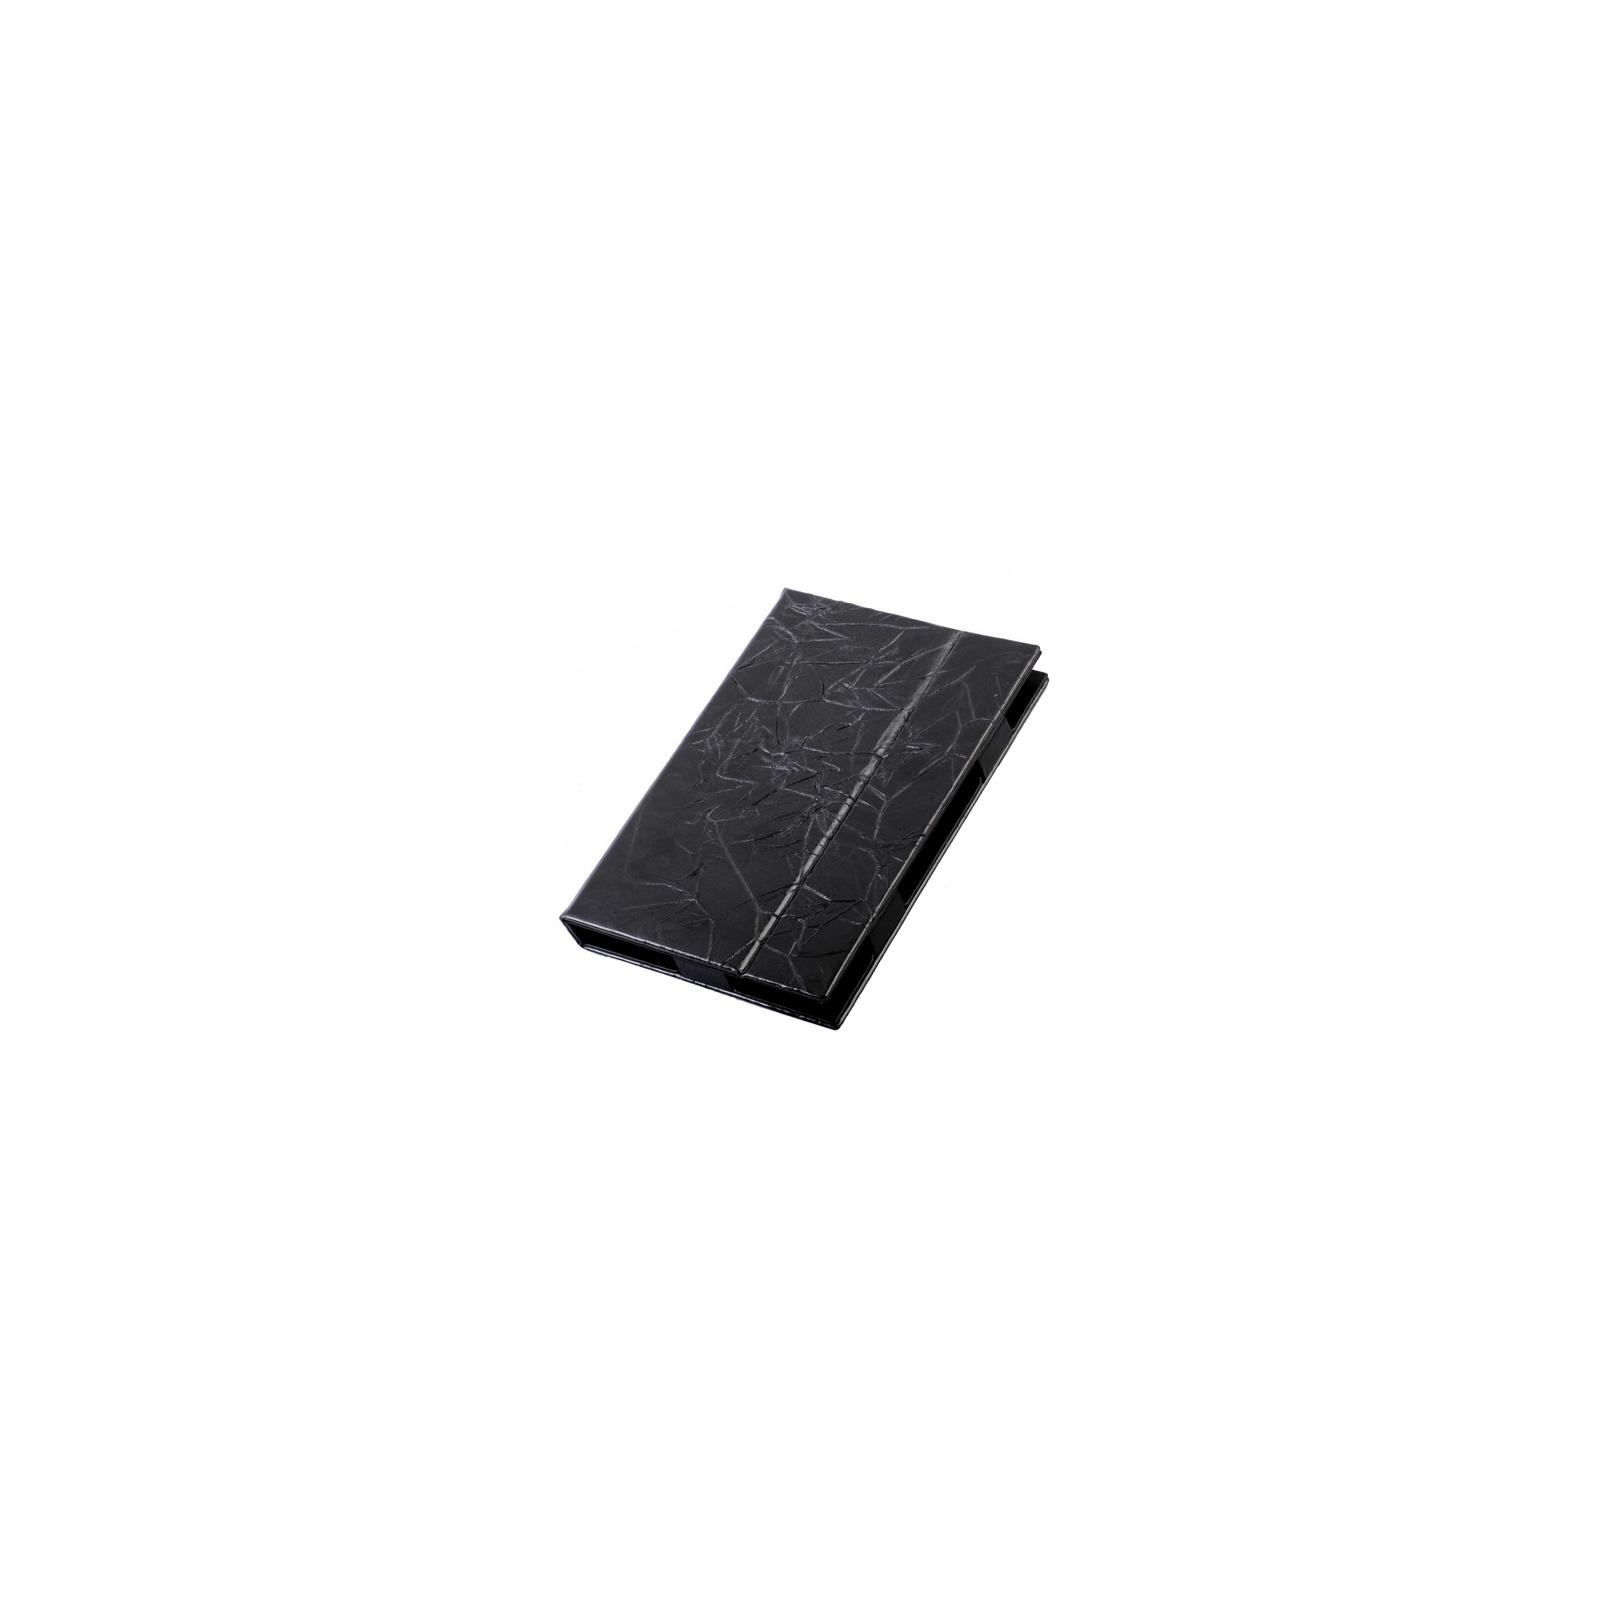 Чехол для планшета Vento 10.1 Desire glossy -ozone